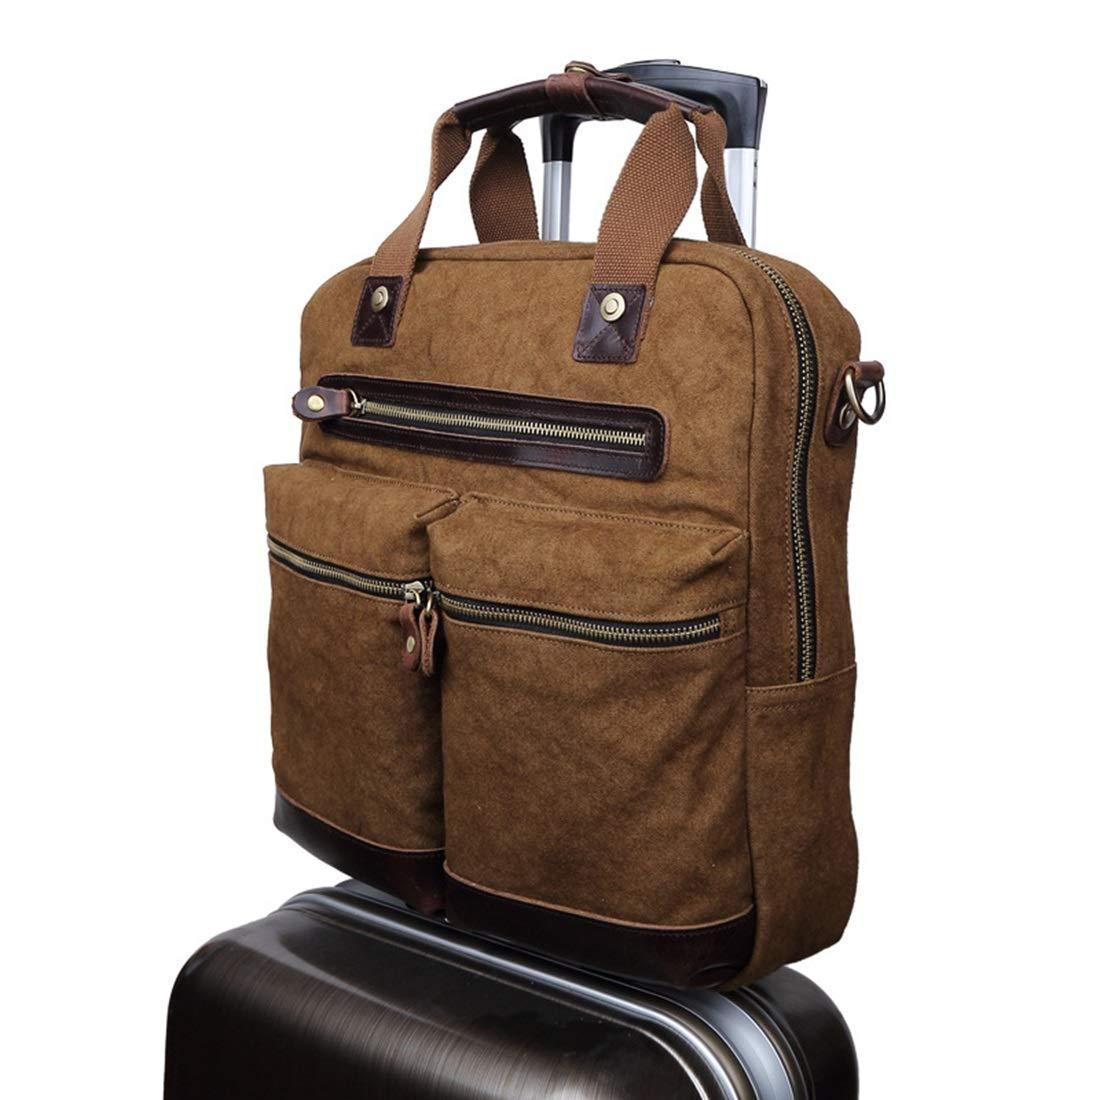 Color : Coffee Color Carriemeow Office Canvas Retro European Style Briefcase Shoulder Messenger Crossbody Satchel Casual Bag Holder for Men Business